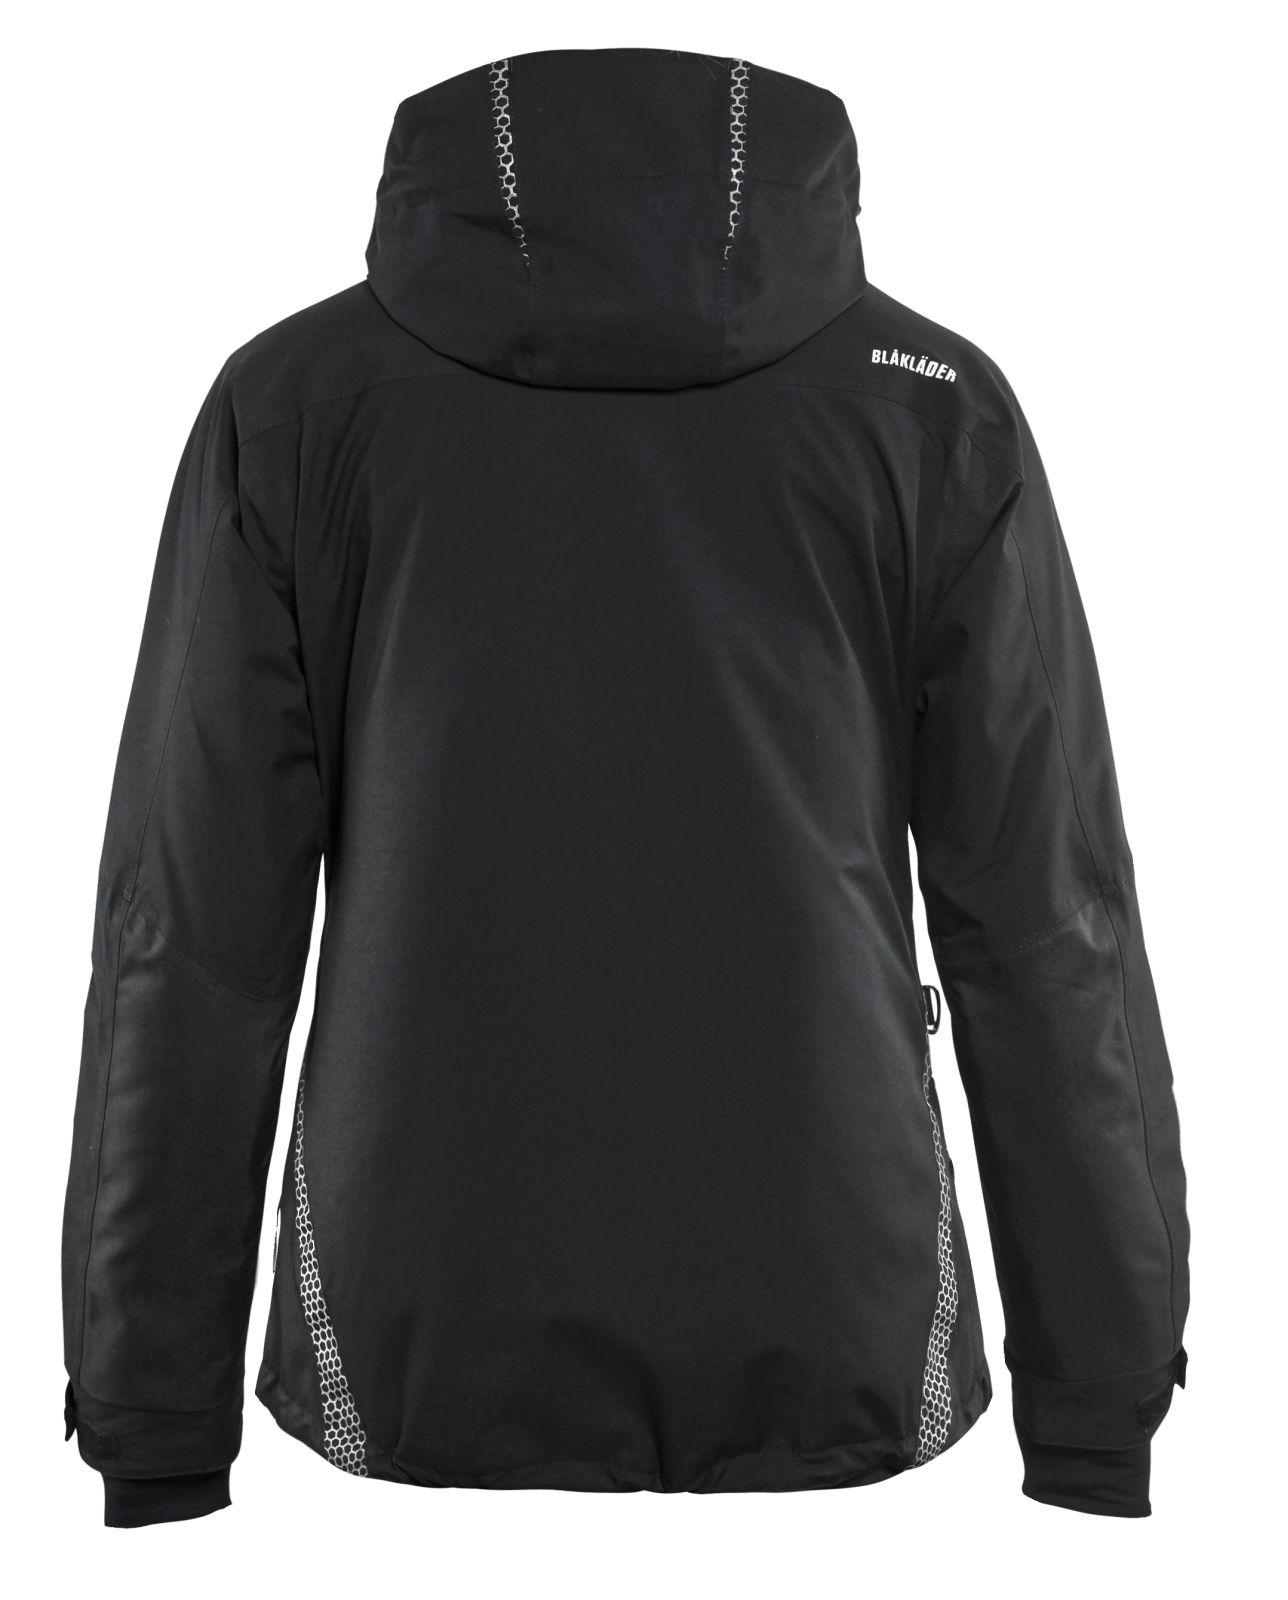 Blaklader Dames winterjacks 49711987 zwart(9900)